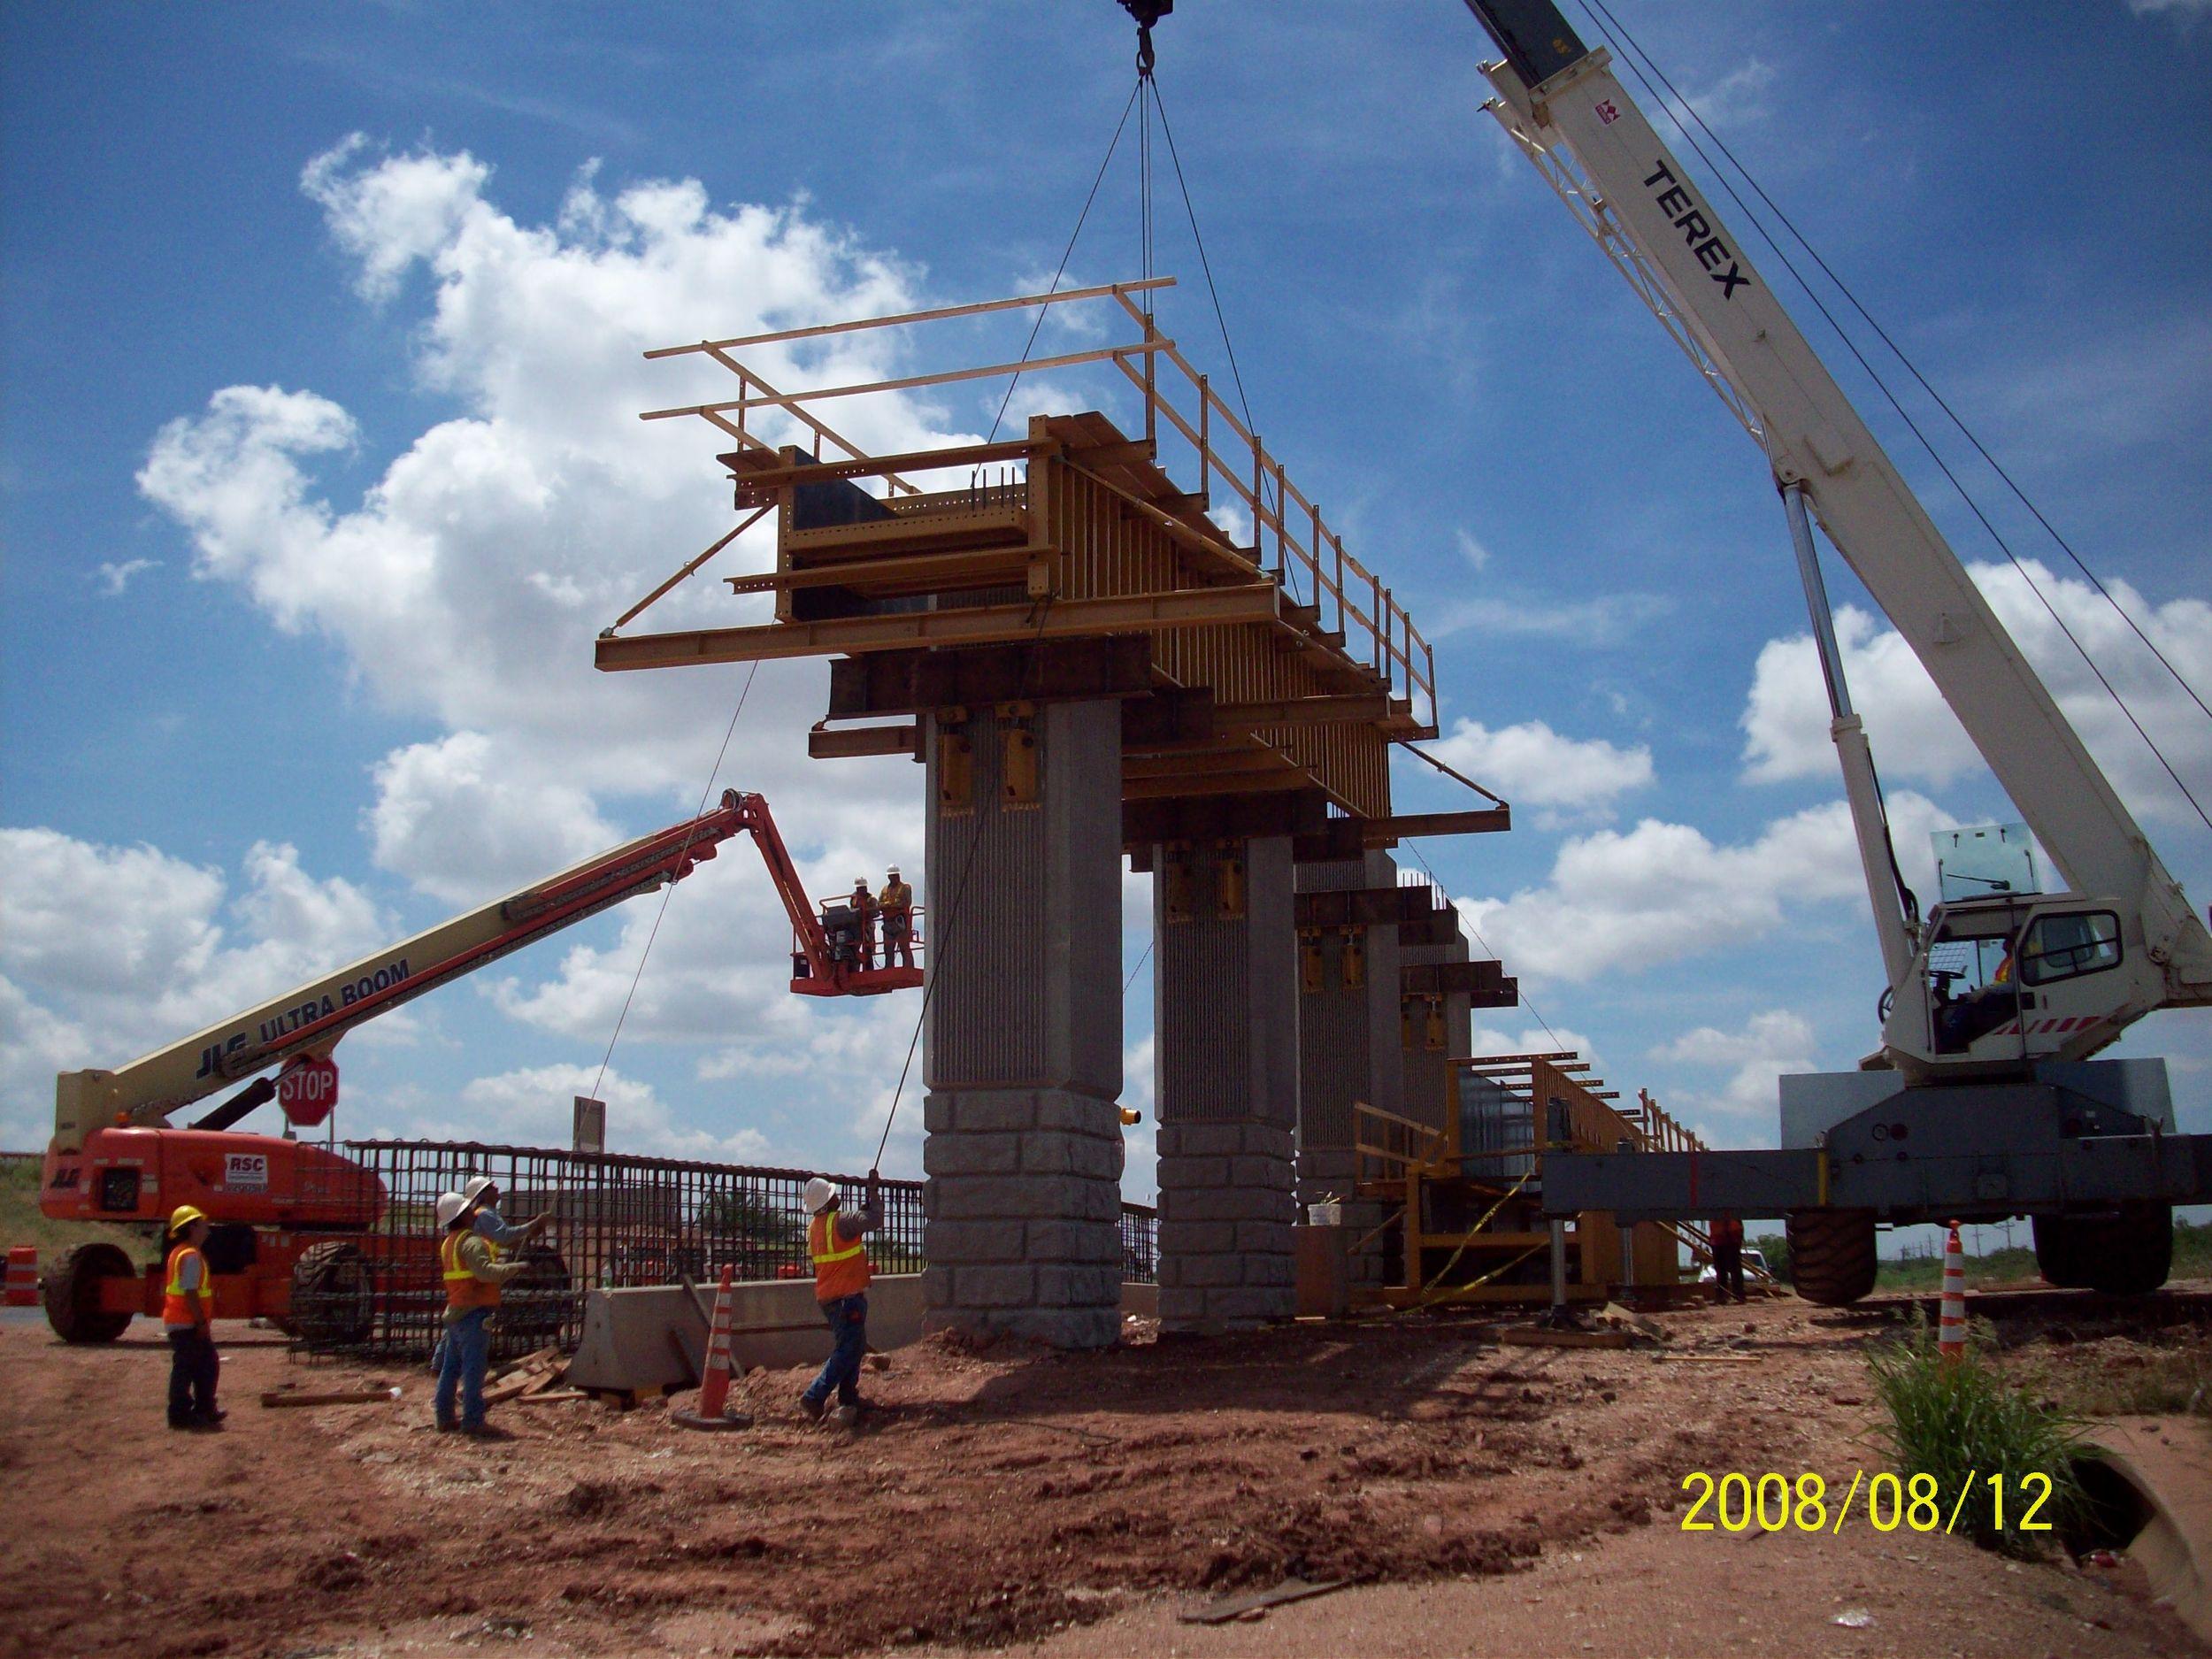 2008-08-12 12012-1 US 84-FM 3438_TxDOT Construction Photos_02.jpg